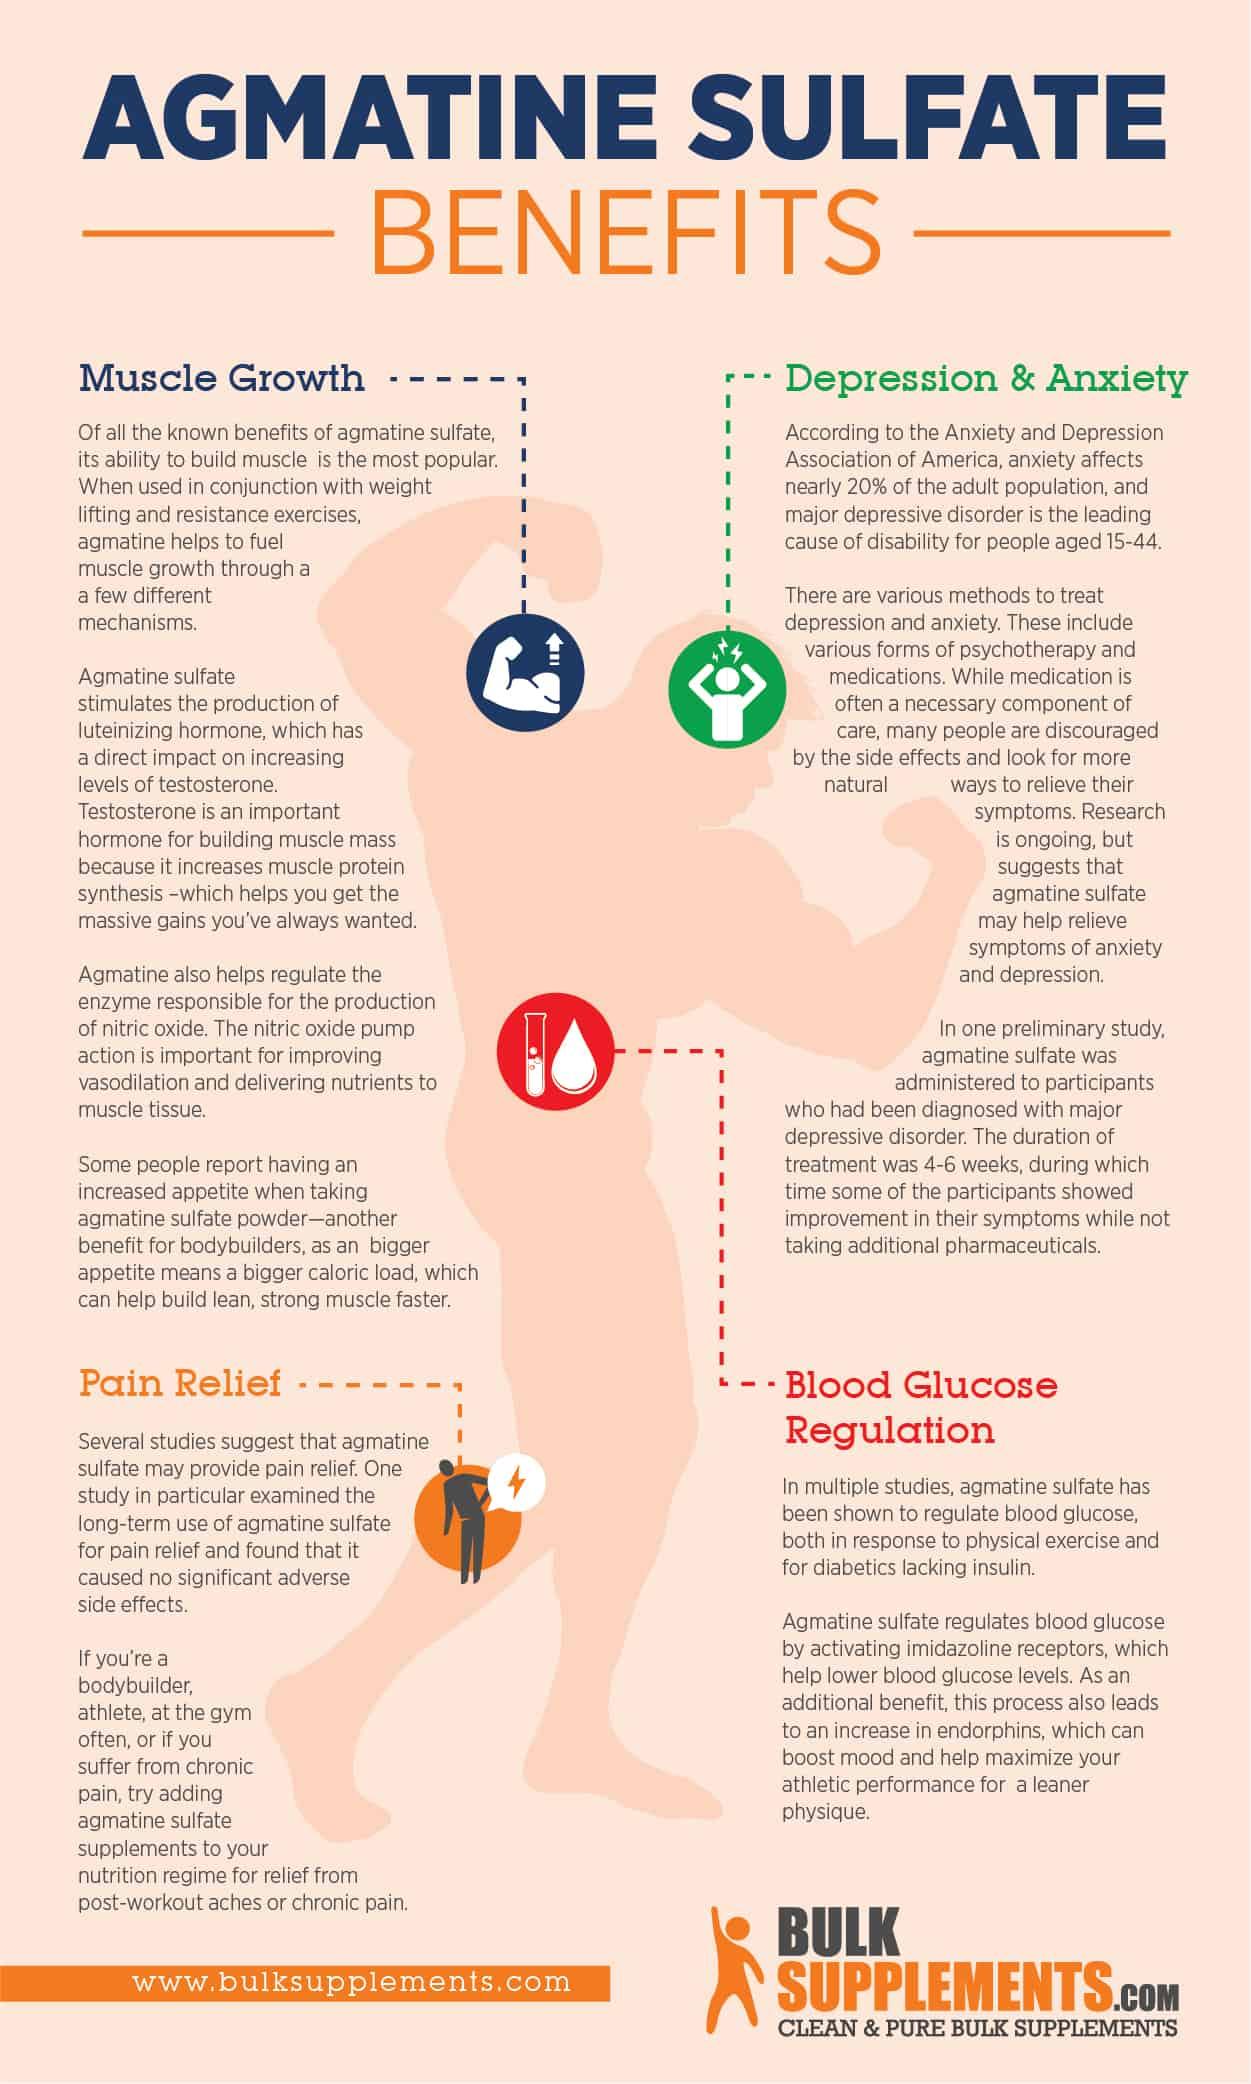 Agmatine Sulfate Benefits